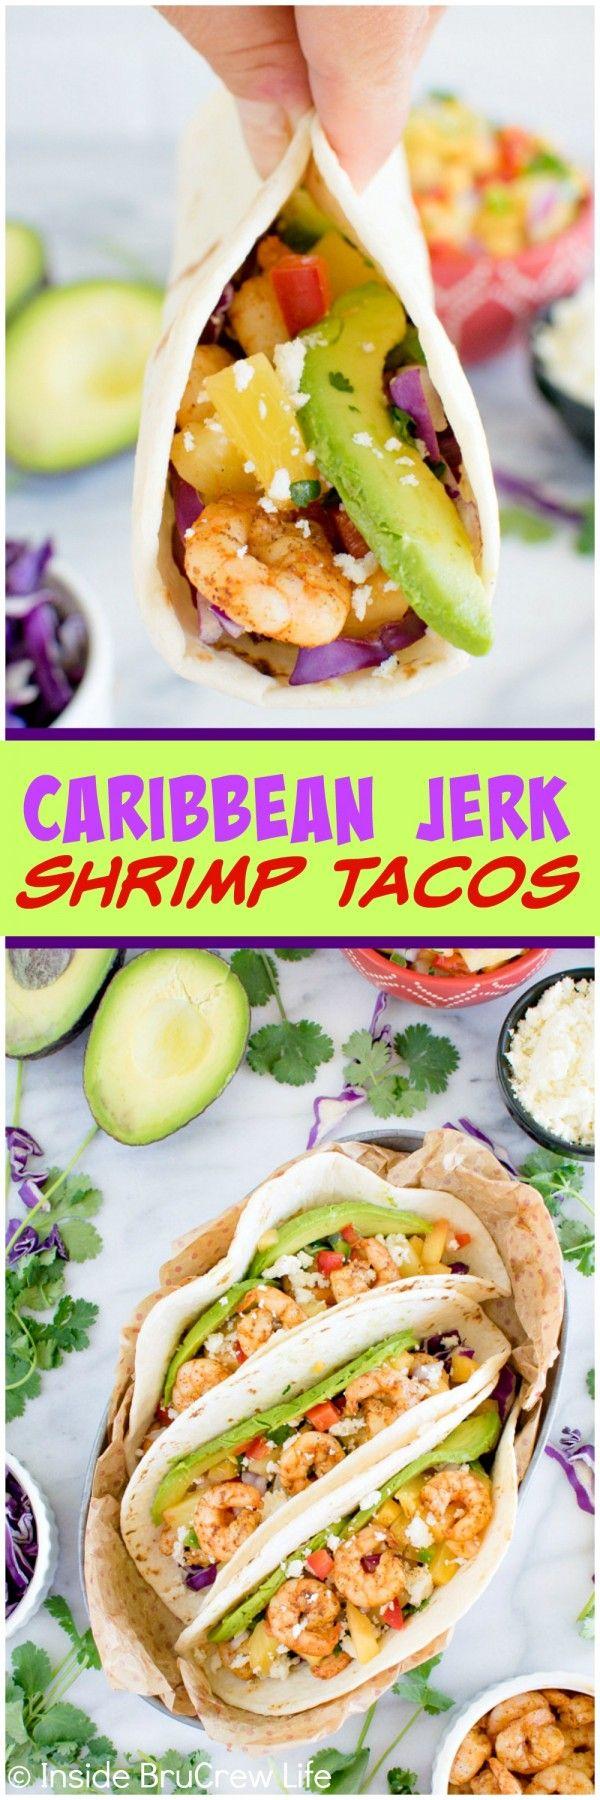 Caribbean Jerk Shrimp Tacos - spicy shrimp, fruit salsa, veggies, & cheese make these tacos a delicious dinner idea. Great fresh recipe! #jerkshrimp